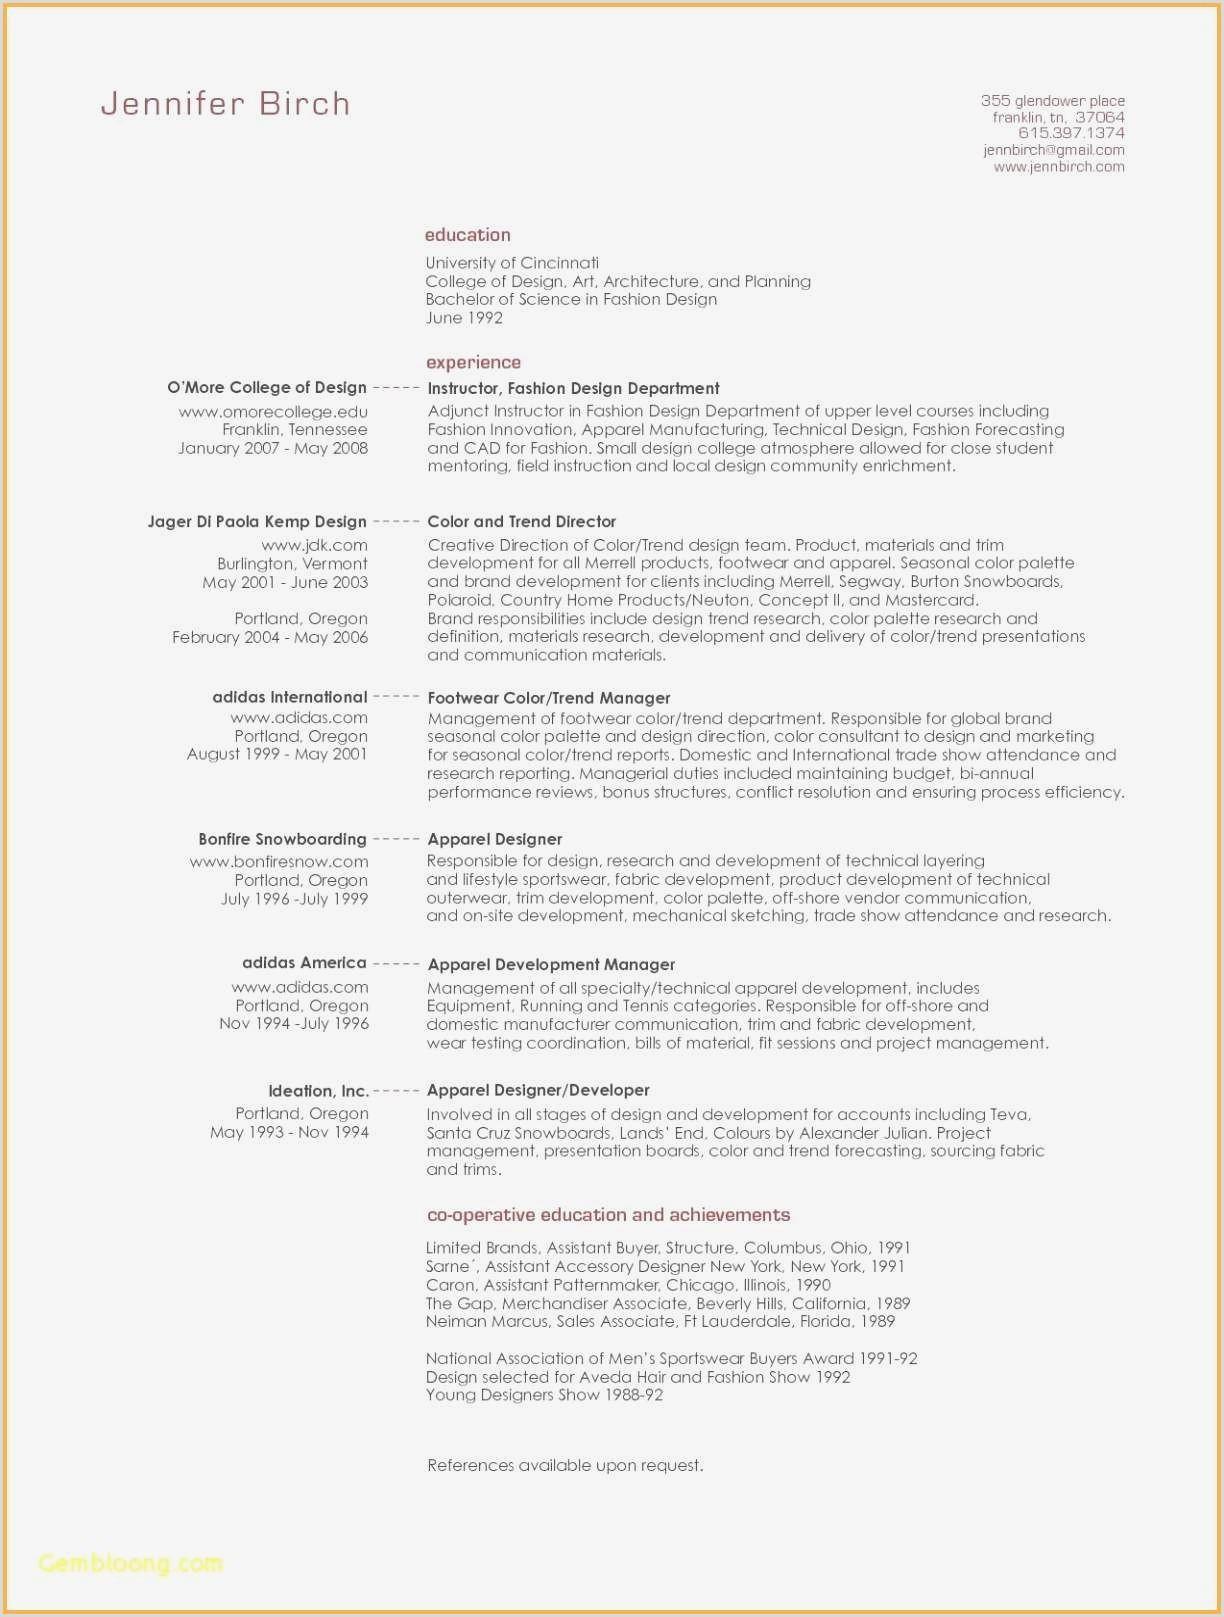 Merchandiser Job Description Resume Sample Resume for Sales and Marketing assistant New Samples